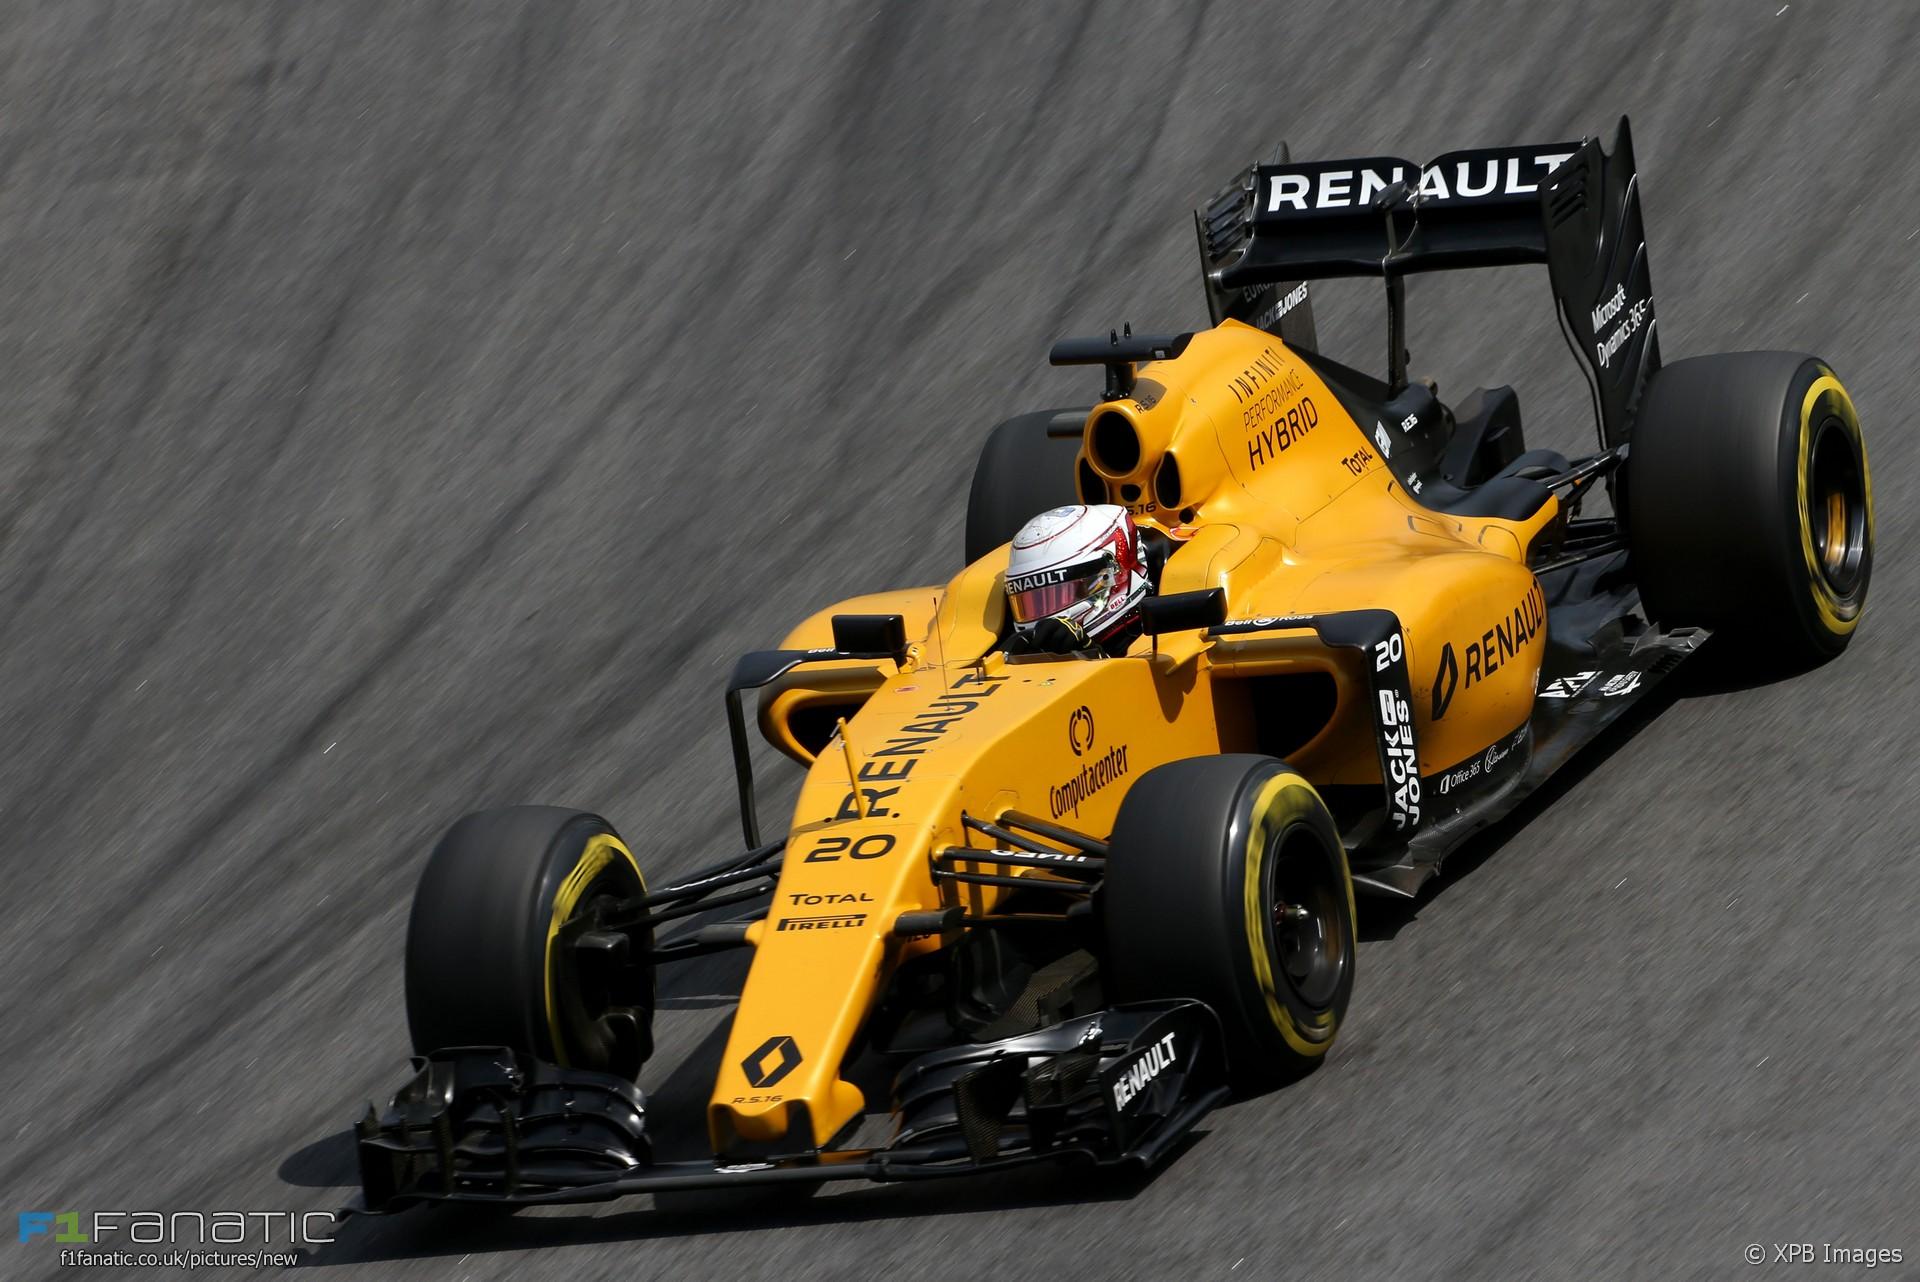 Kevin Magnussen, Renault, Interlagos, 2016